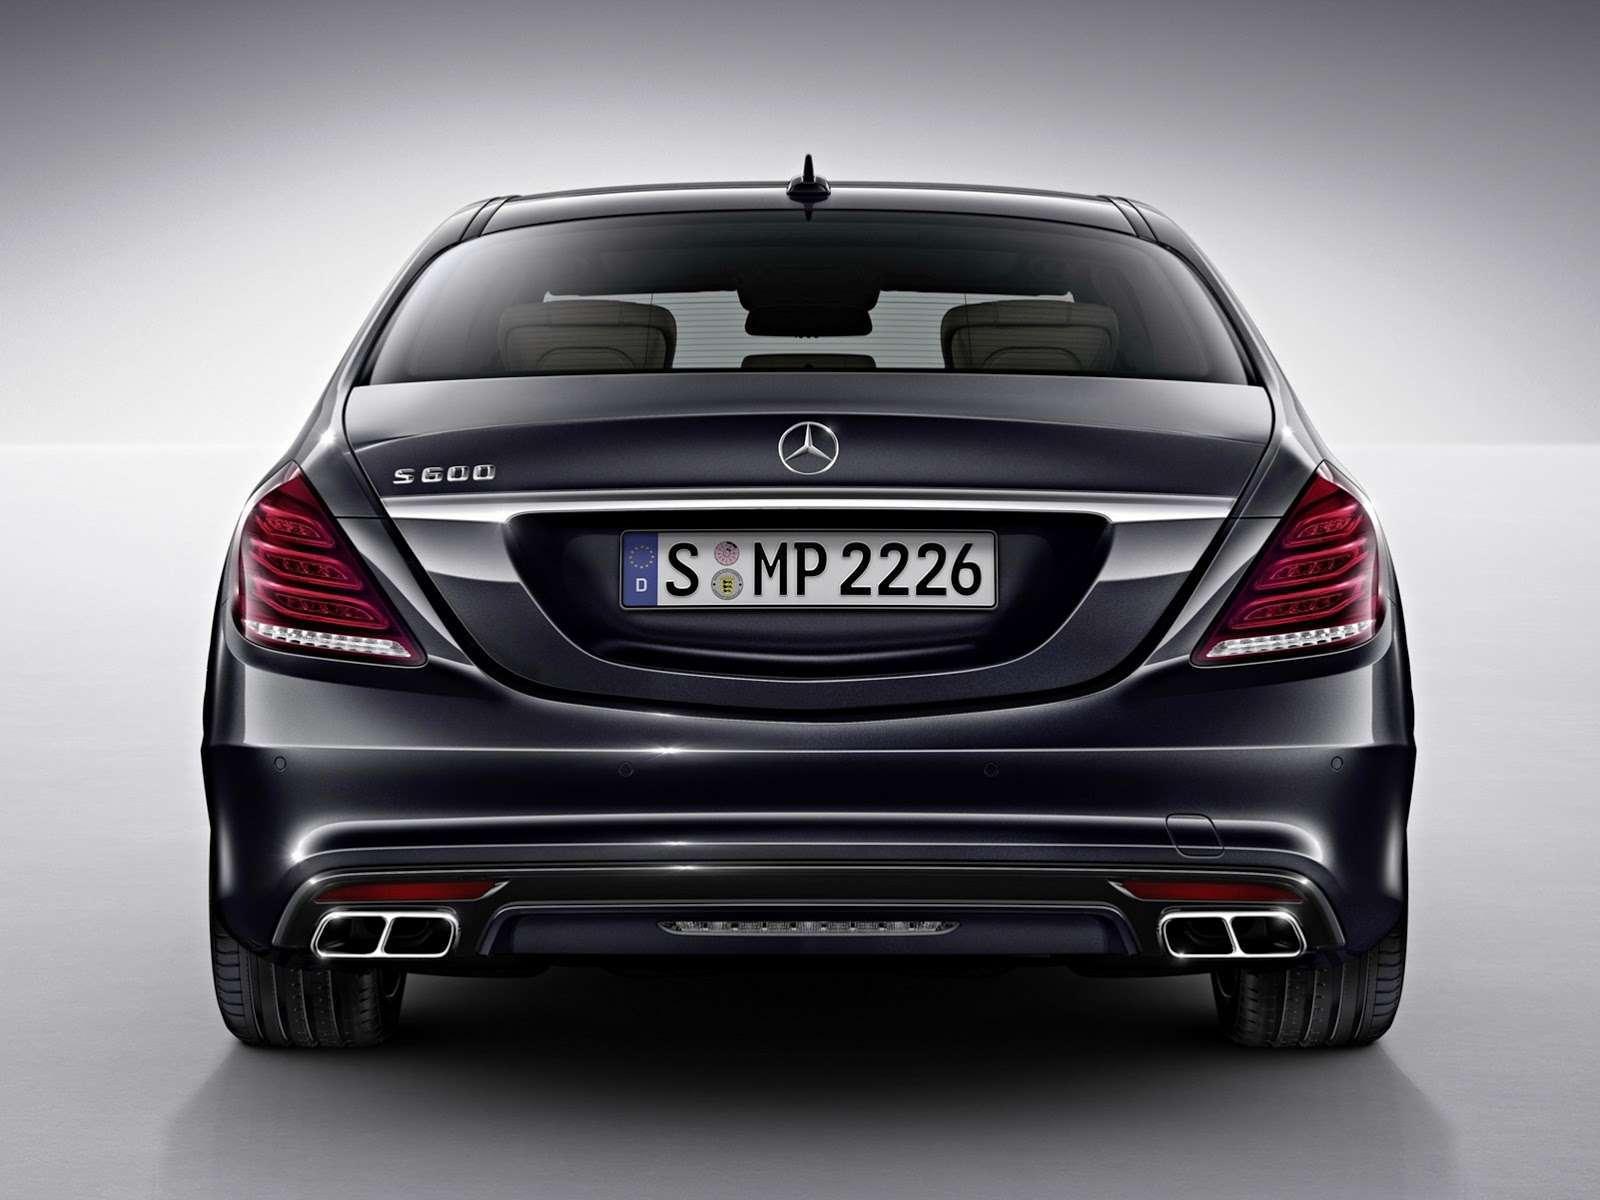 Mercedes-Benz S600 2014